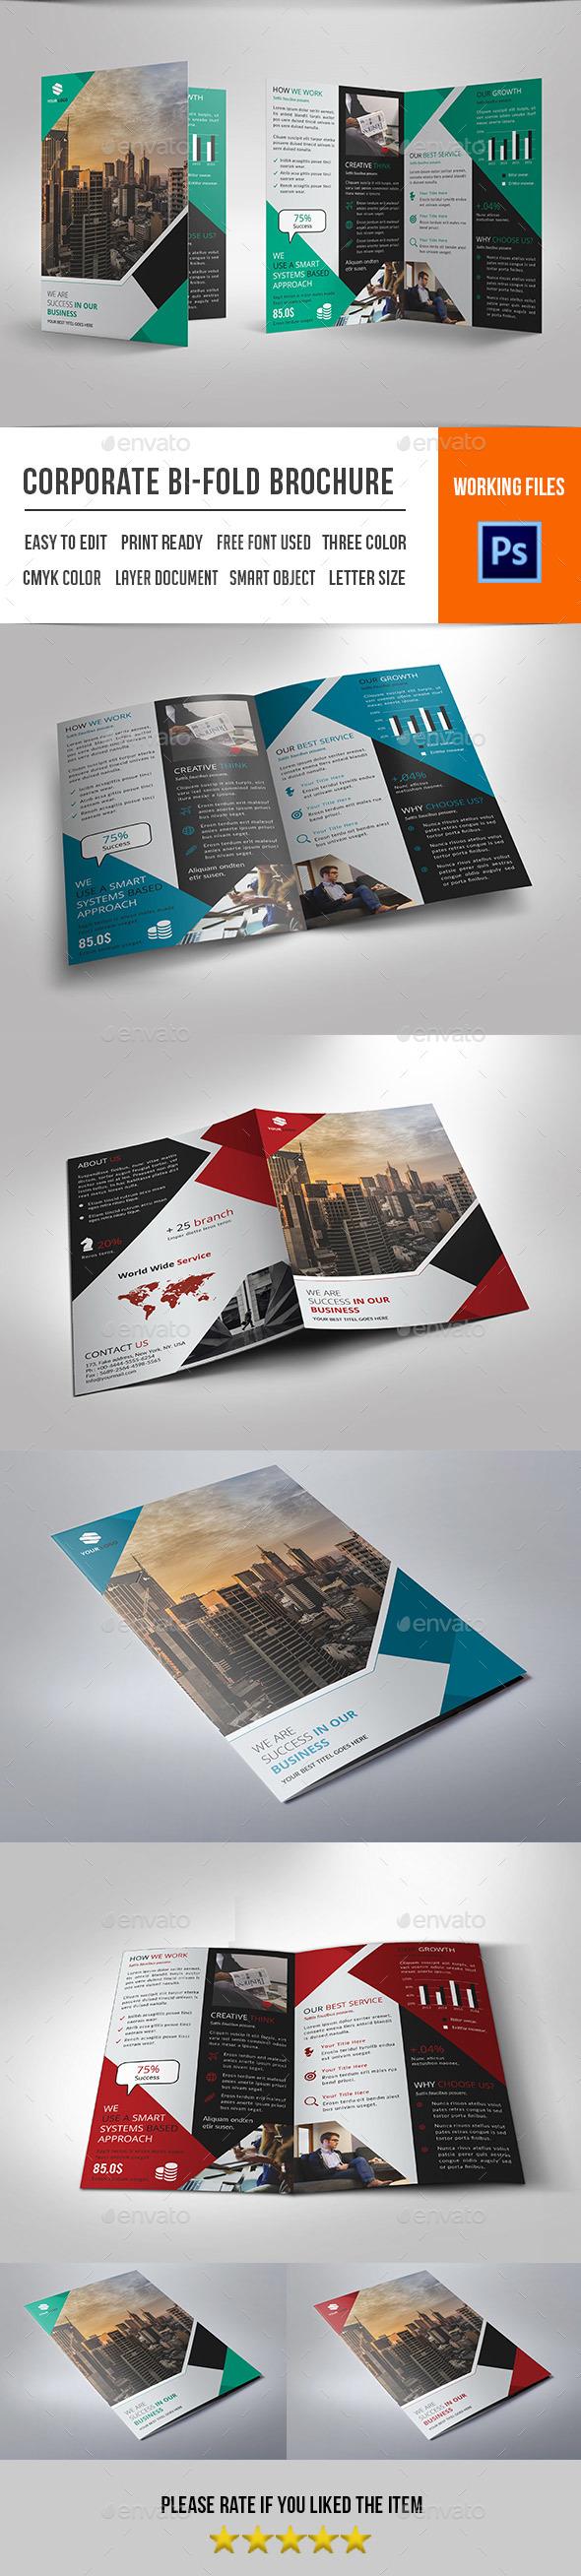 Bifold Brochure for Business-V420 - Corporate Brochures